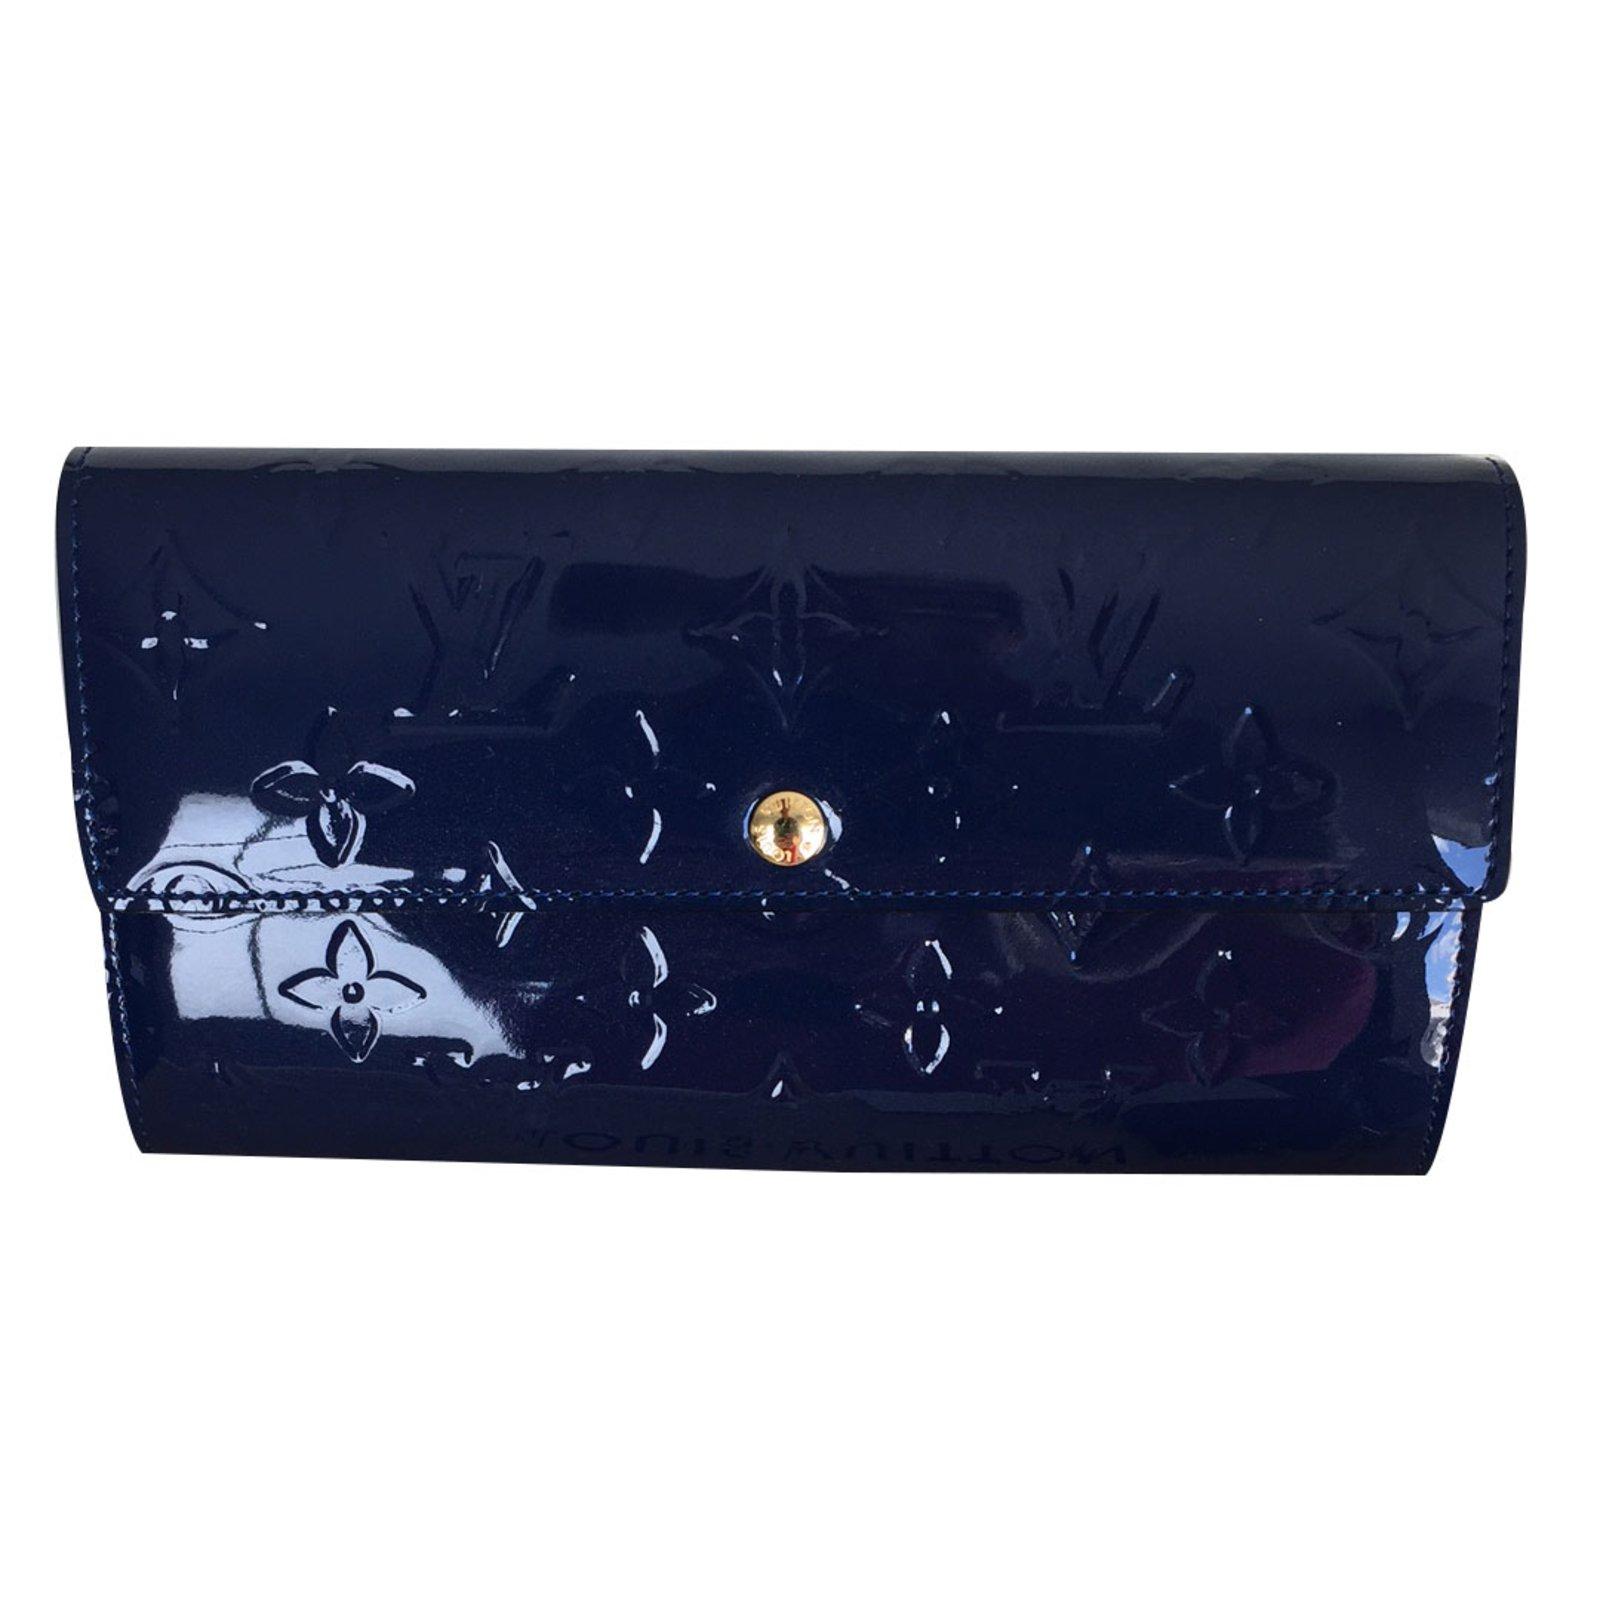 Portefeuilles Louis Vuitton Portefeuille Sarah cuir verni Grand bleu Cuir  vernis Bleu ref.19501 ec88a883c1b